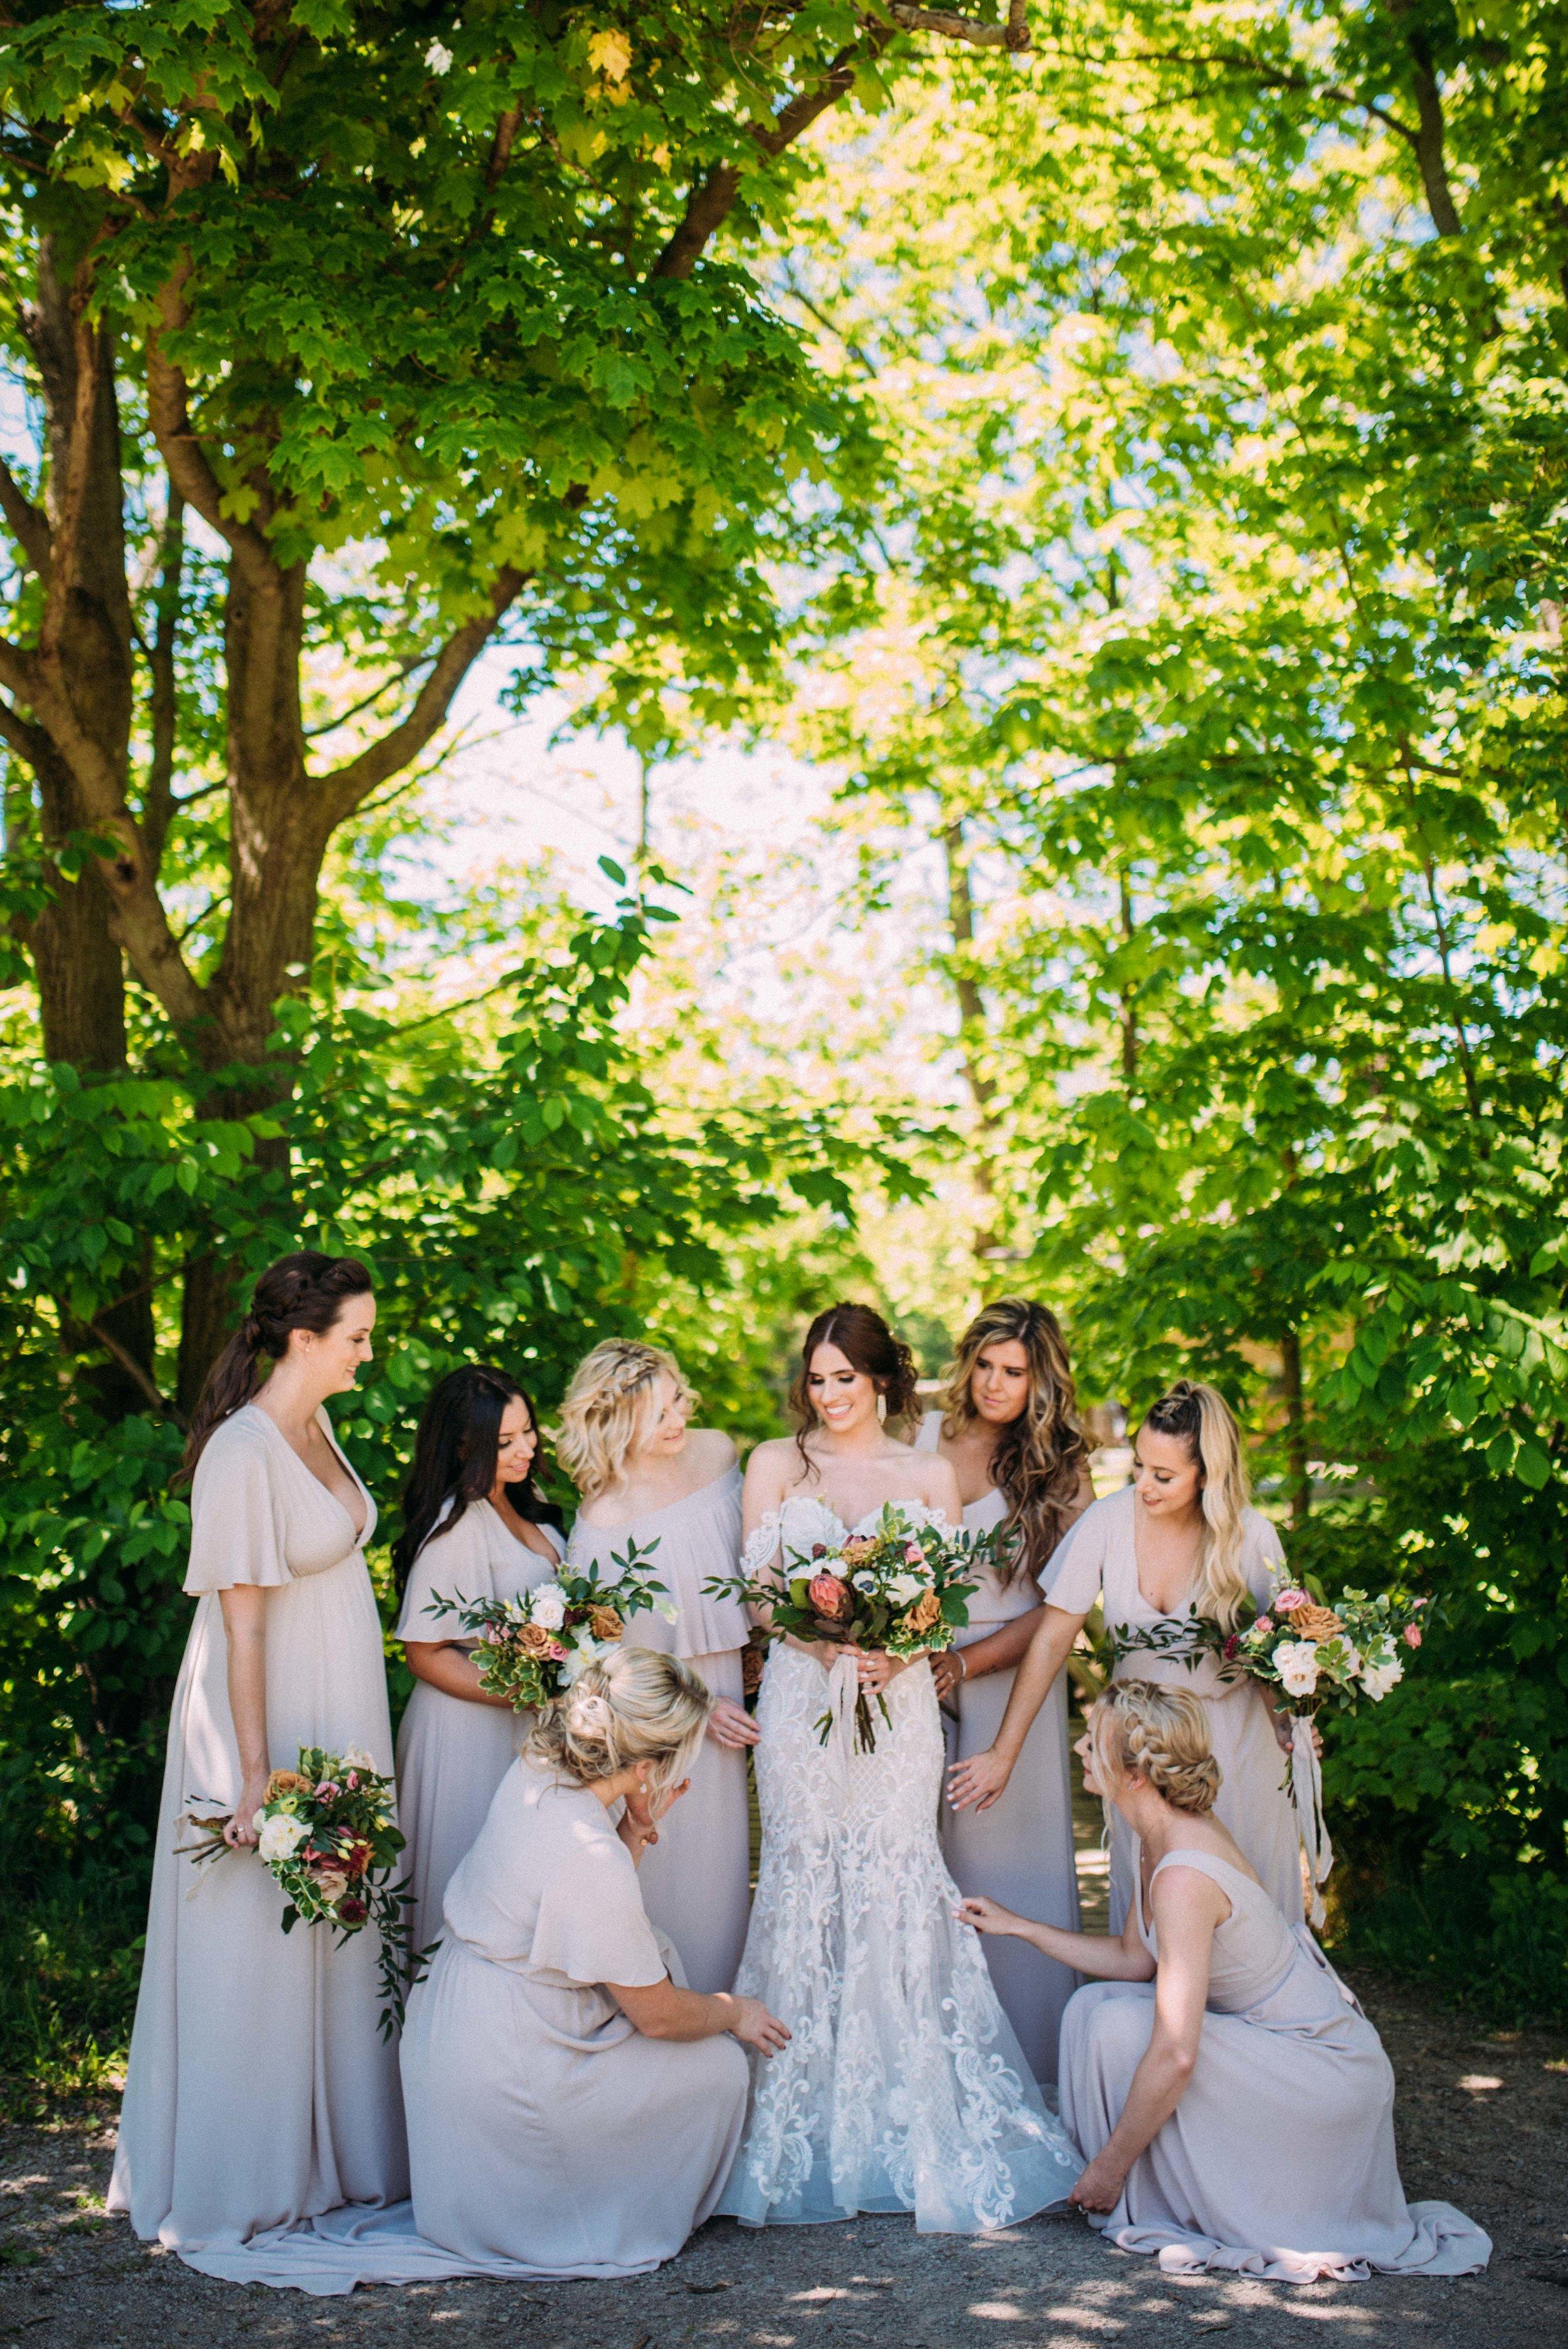 Hamilton wedding photographer, Balls Falls wedding photography with Soundslikeyellowphotography. Bridesmaids.